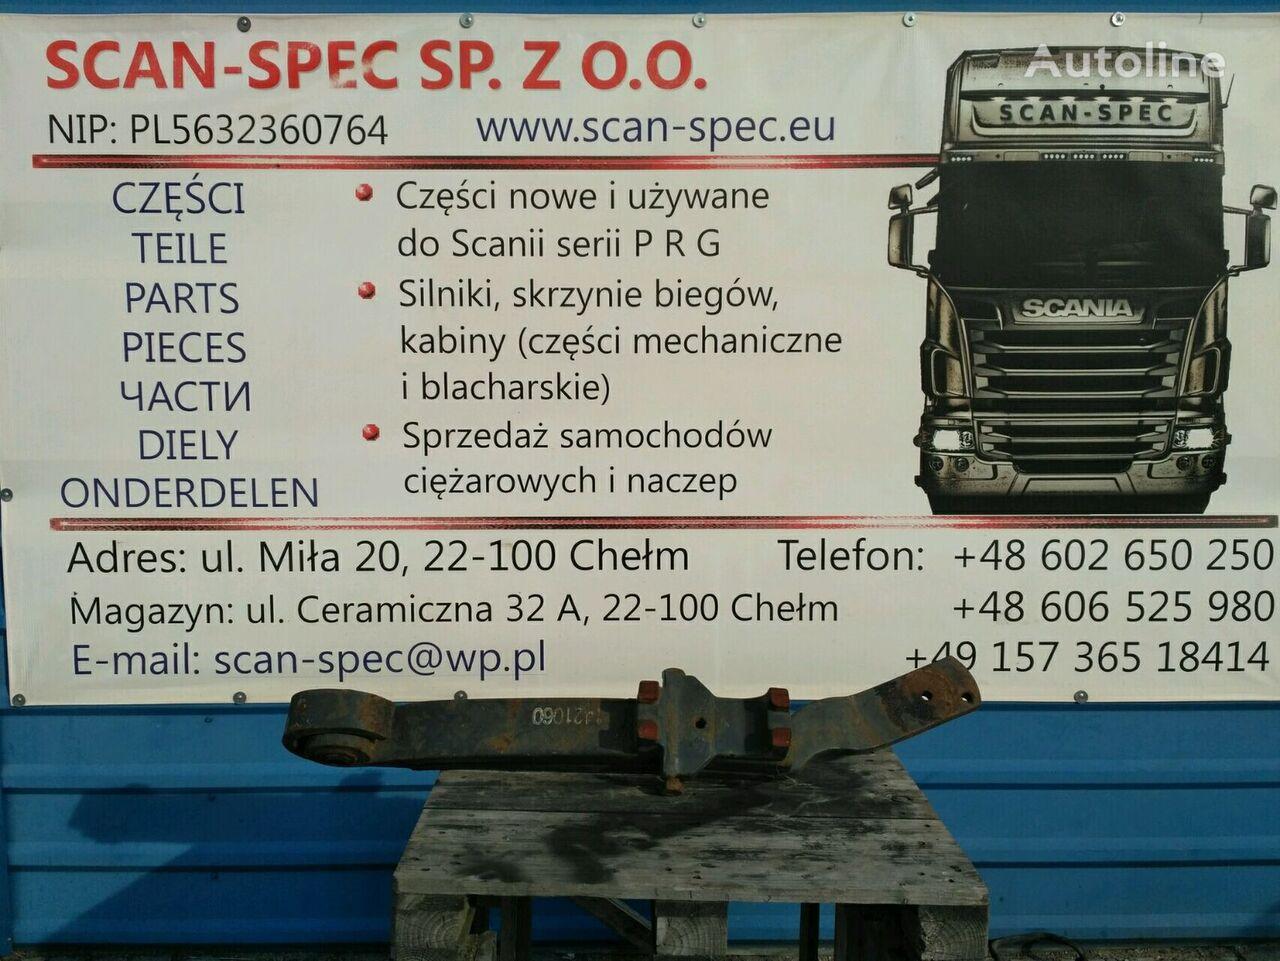 molla a balestra SCANIA 1421060 Lewa strona RH per trattore stradale SCANIA SERIE 4 / R